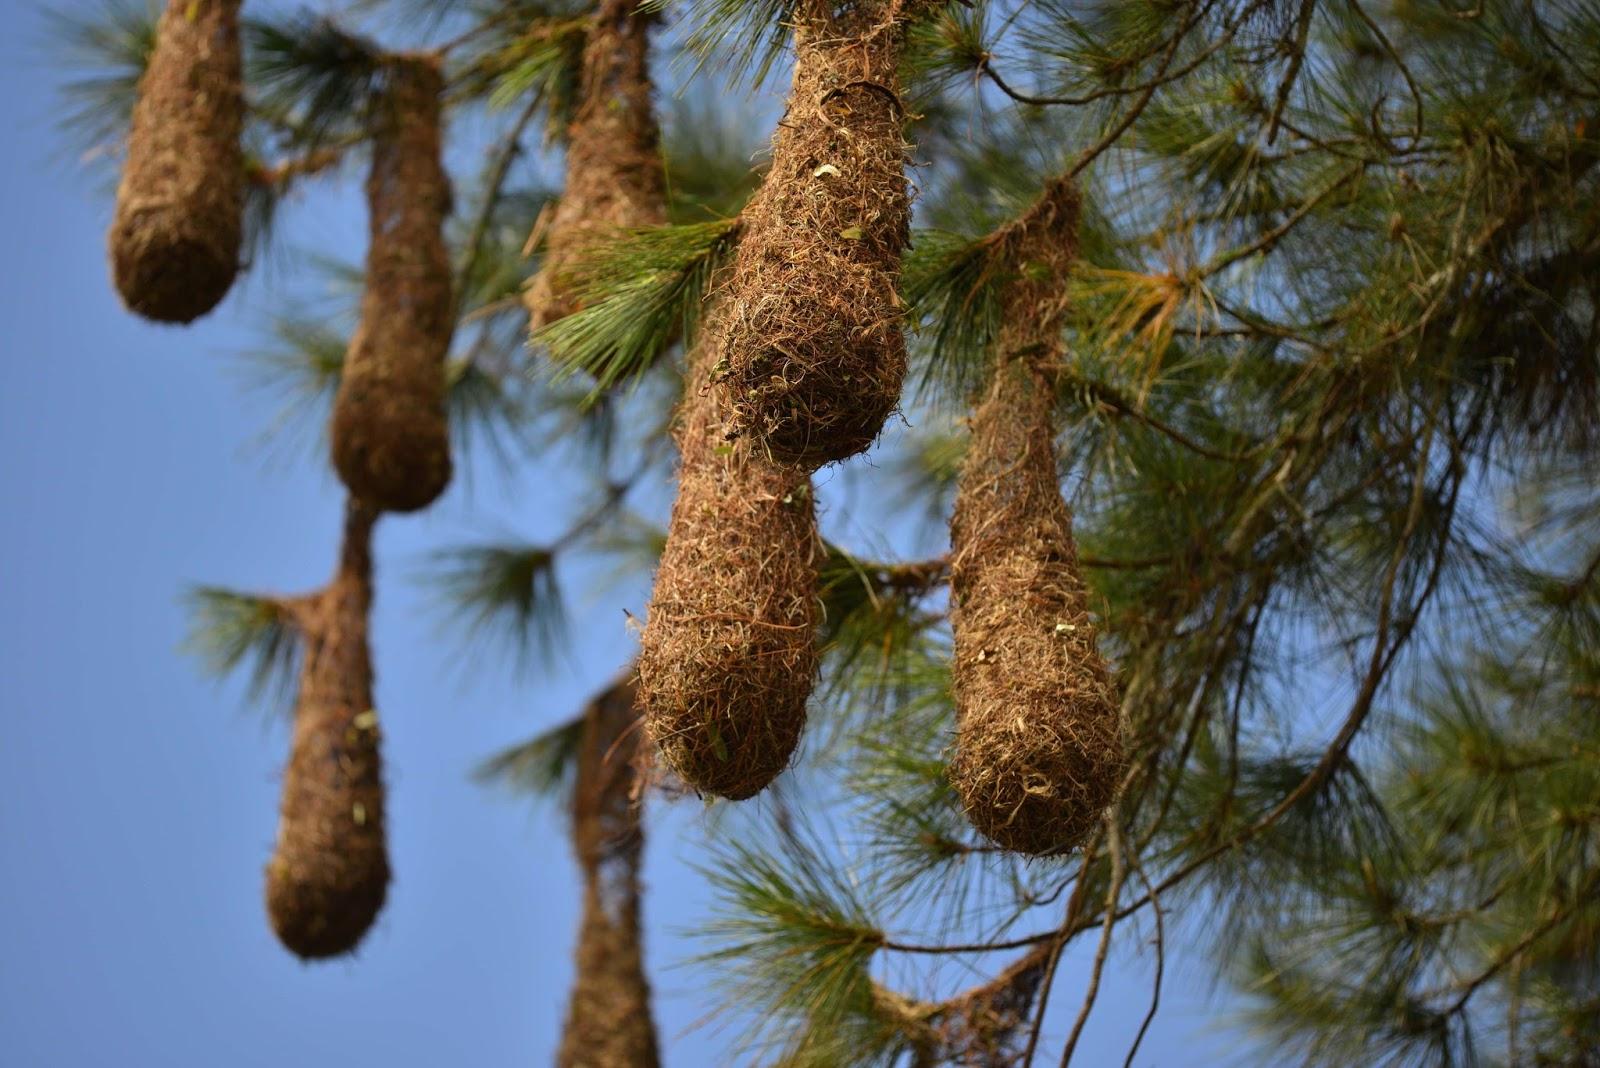 Chim Crested oropendola